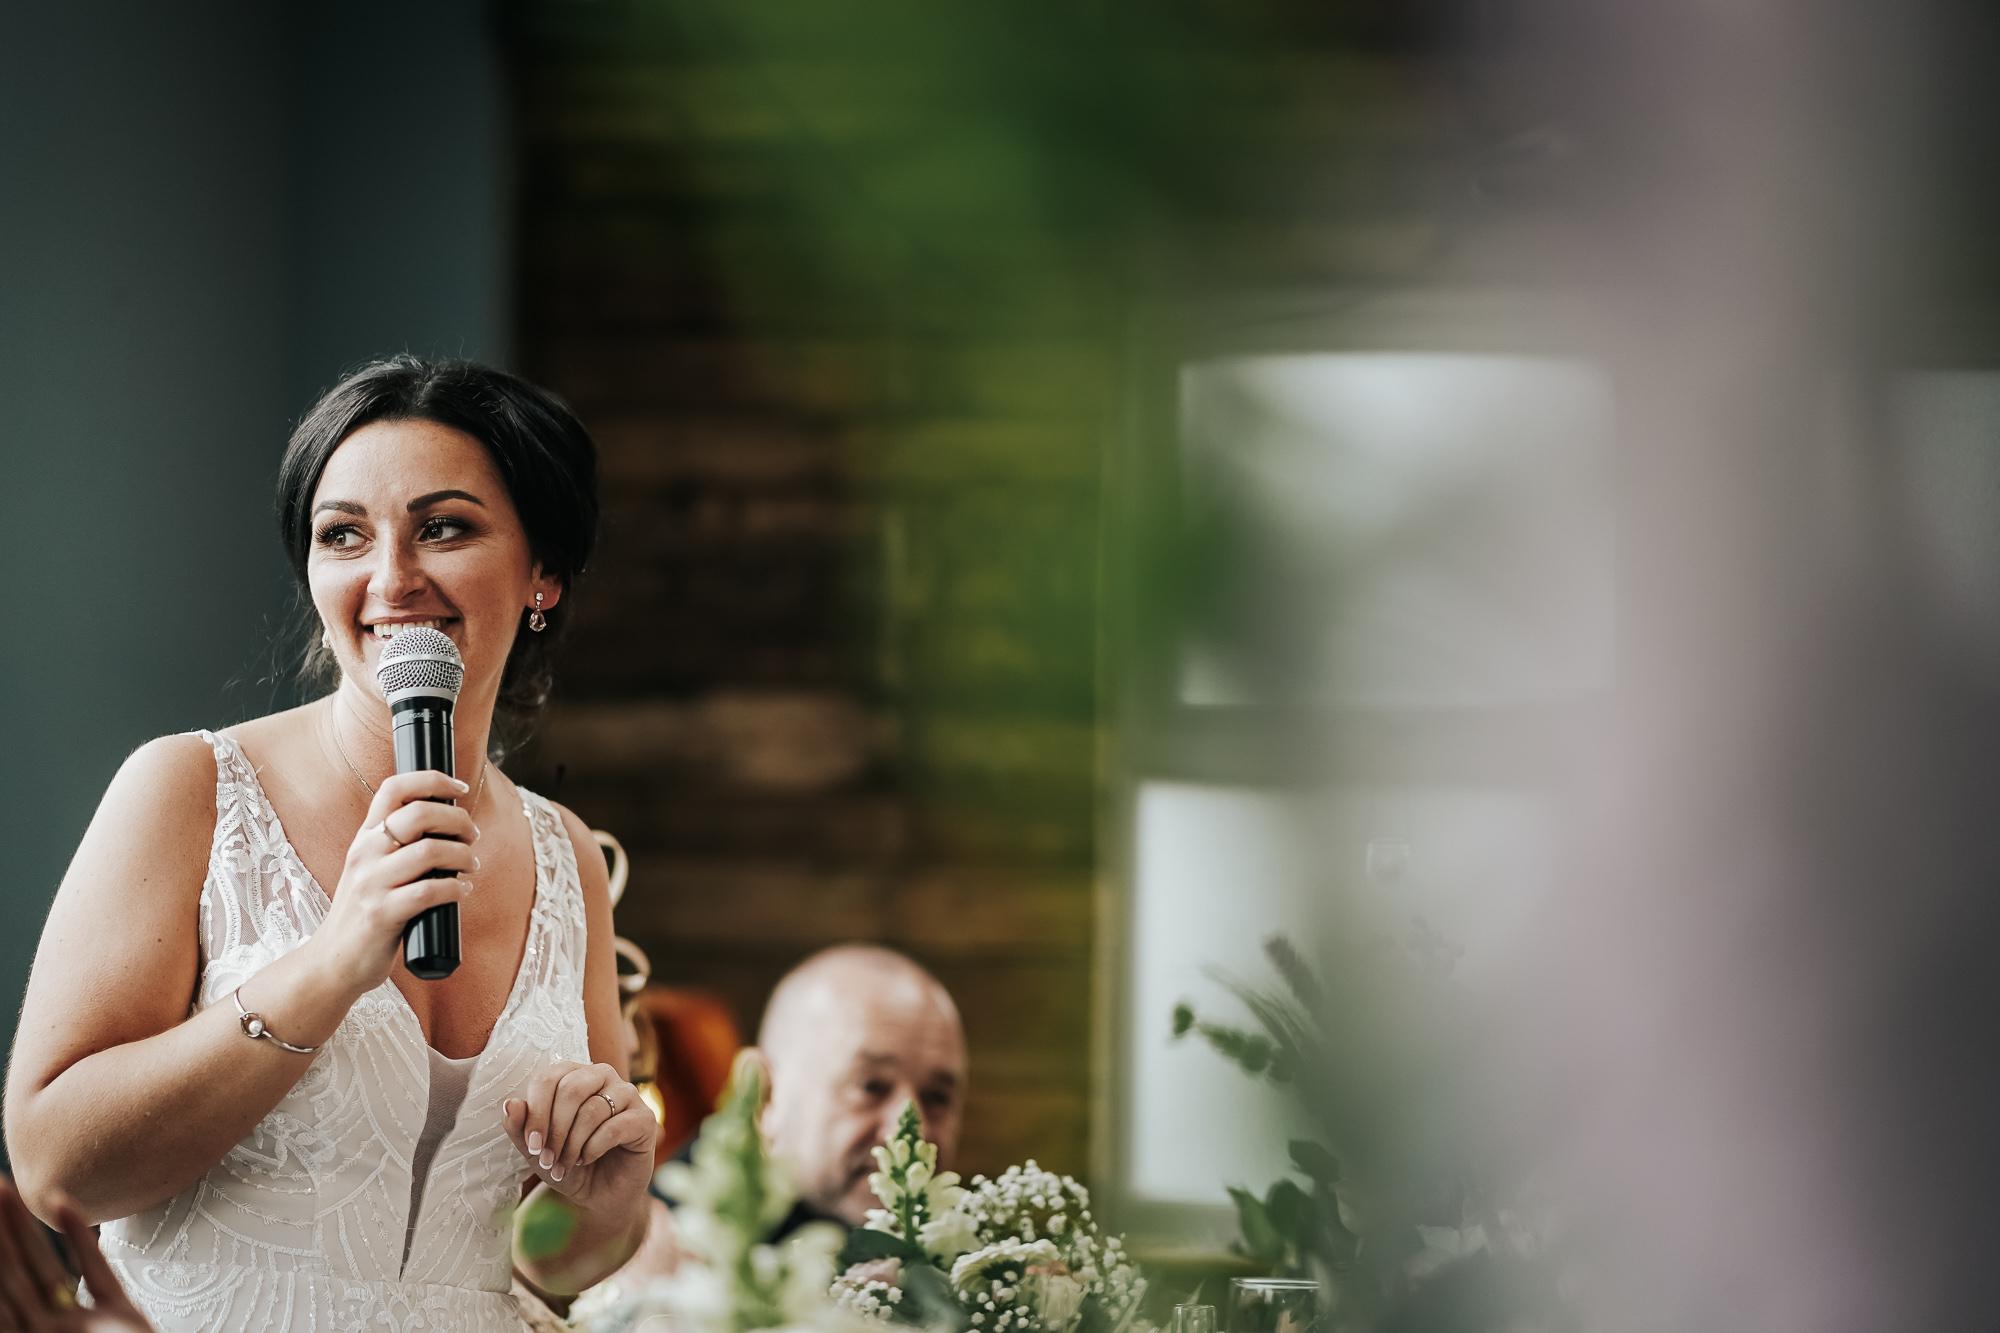 The Hayloft Wedding Photography Cheshire wedding photographer (47 of 52).jpg